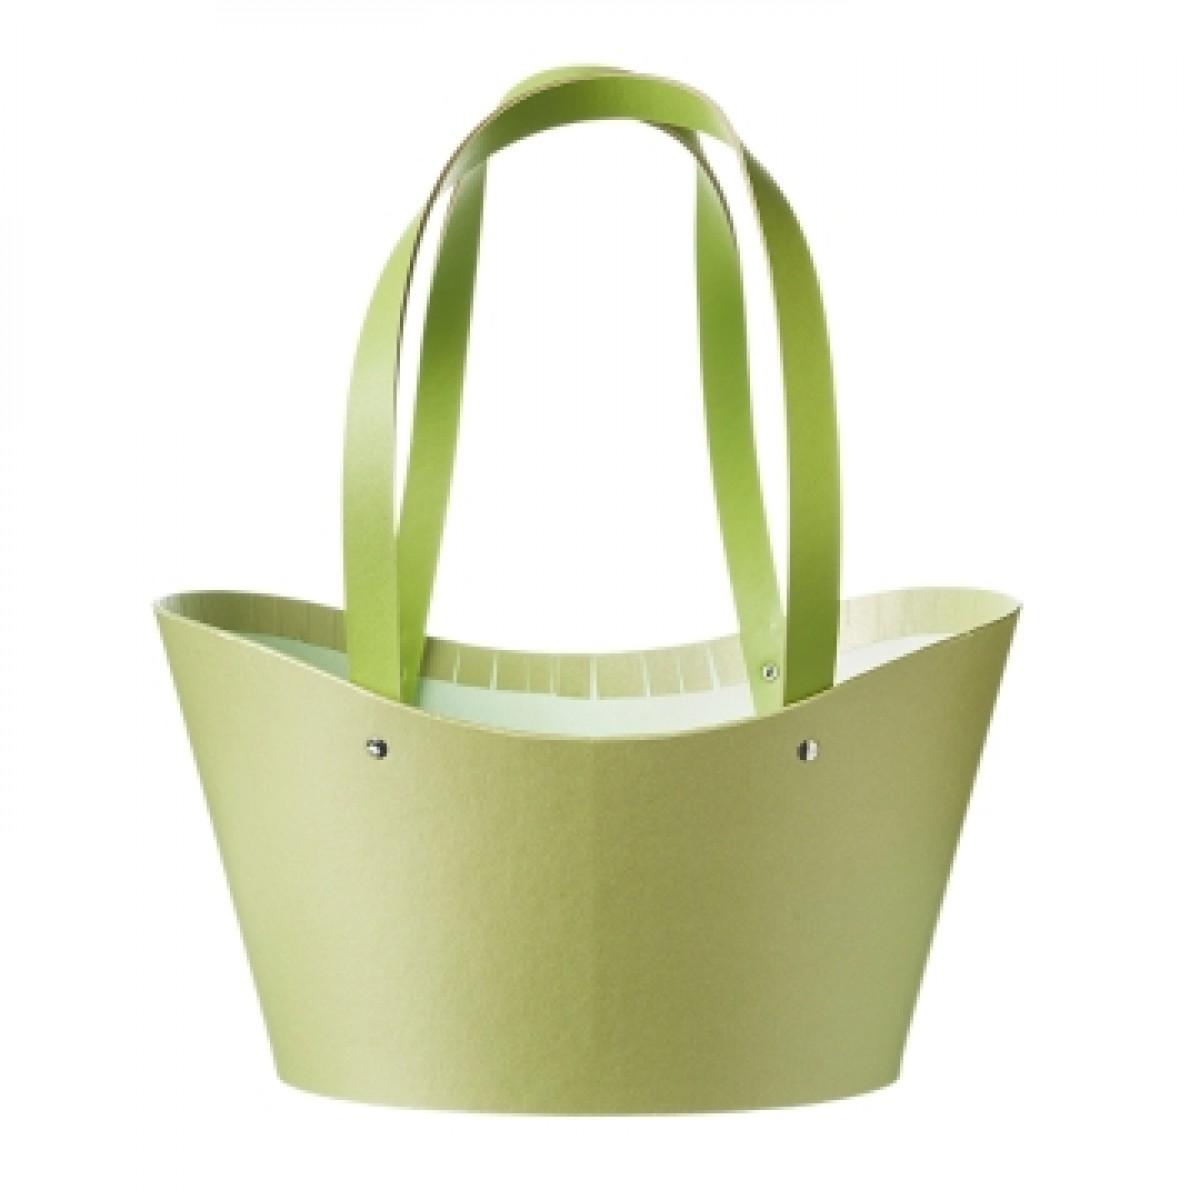 5033 Napier Basket Paper Lined Green (Pack of 3)